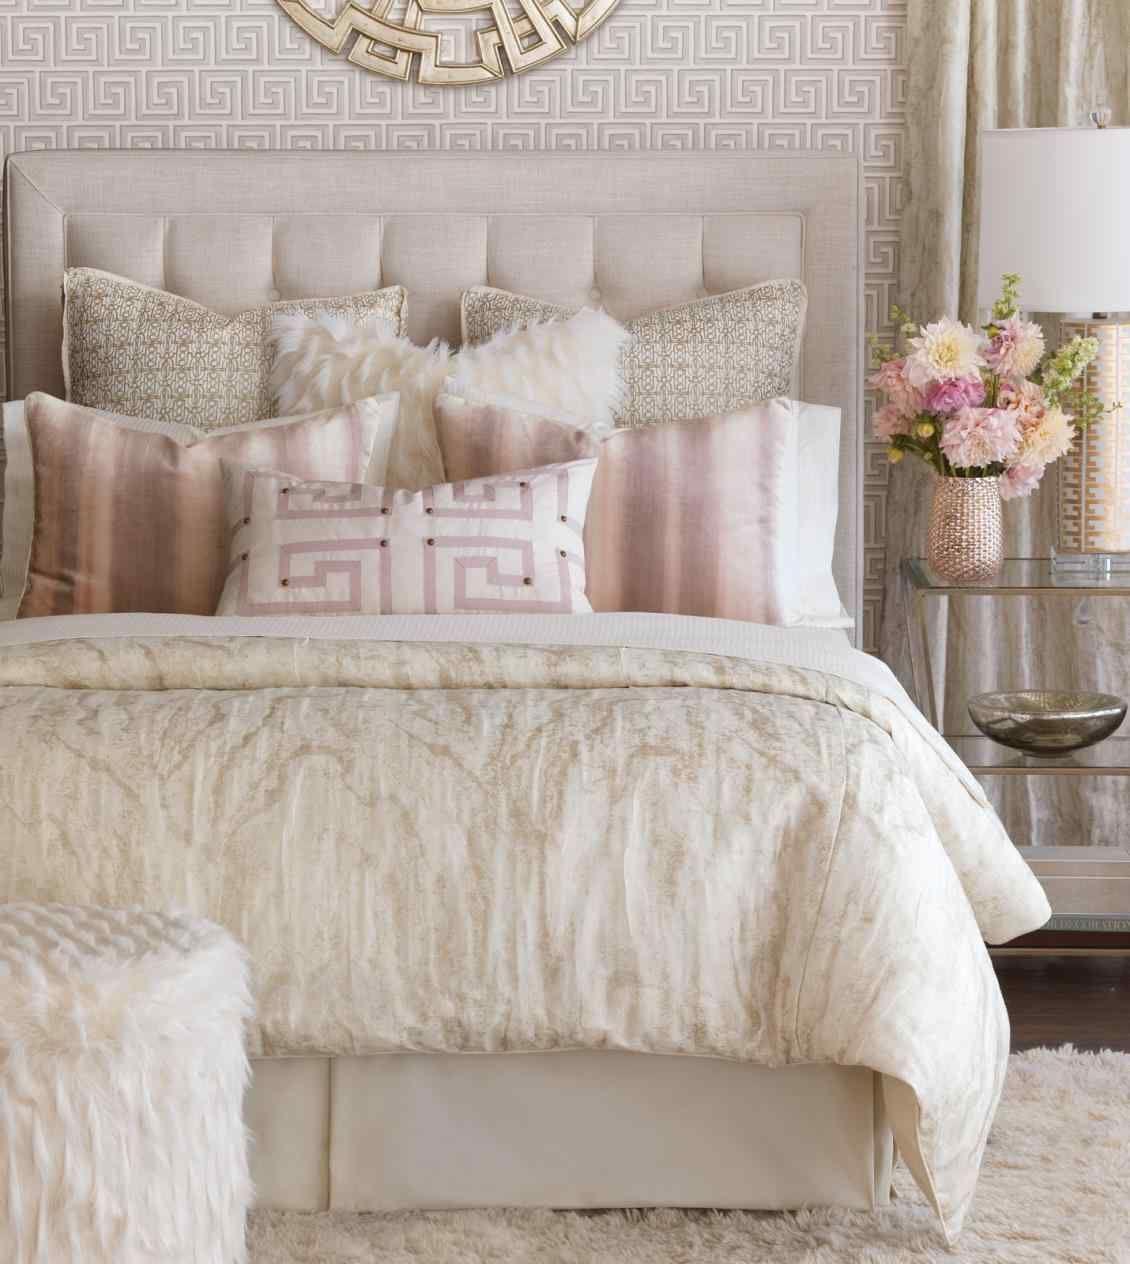 Beau Outstanding Top 10 Luxurious Feminine Bedroom Sets Ideas  Https://breakpr.com/